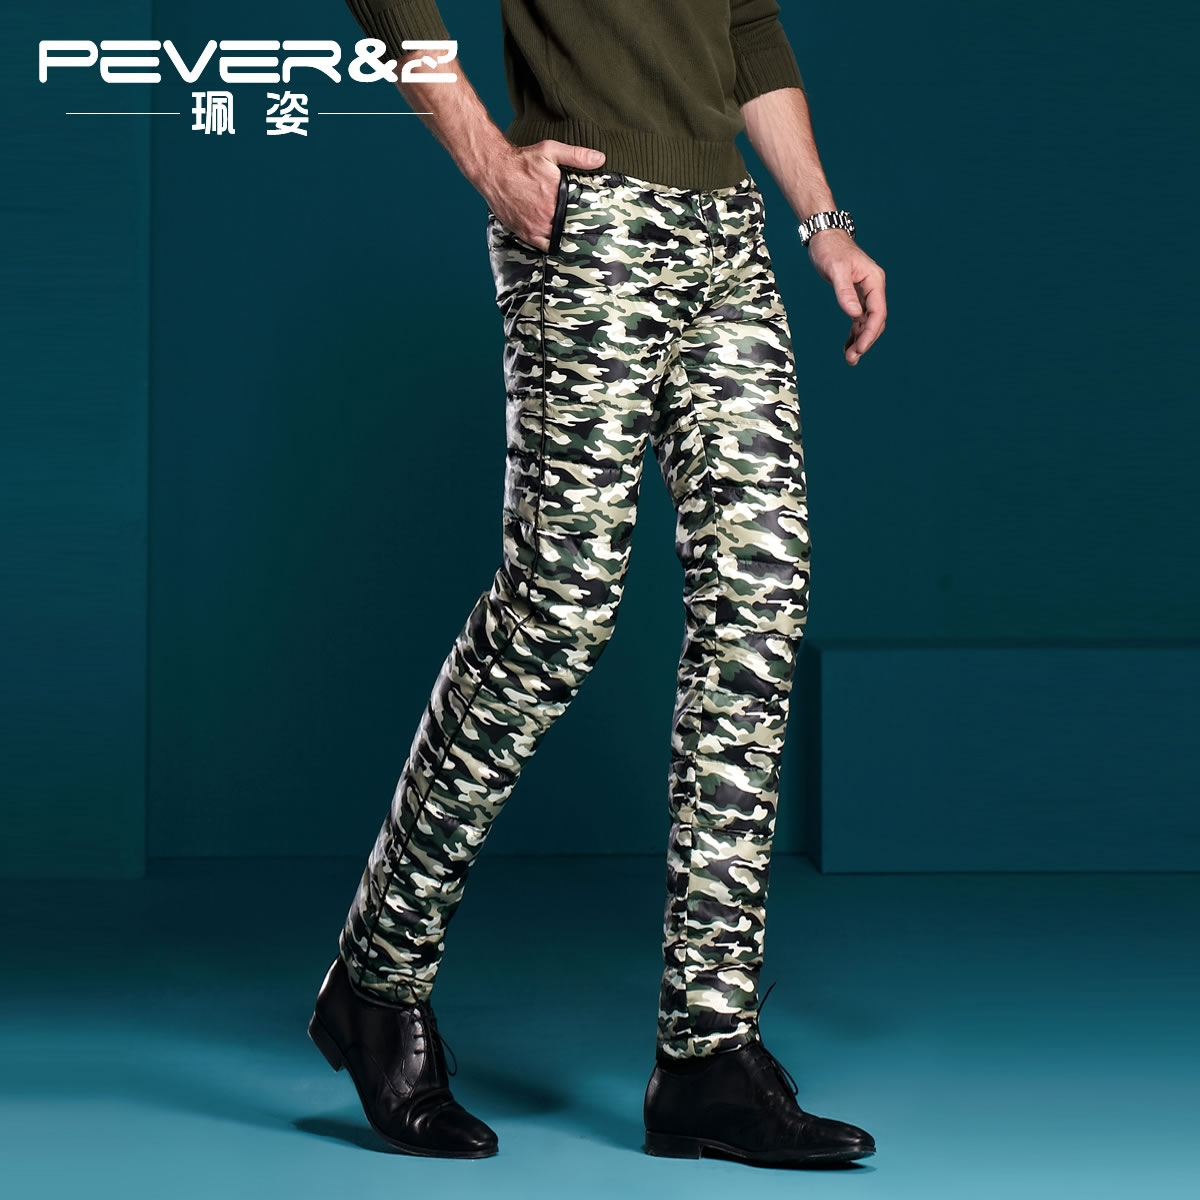 Утепленные штаны Pever & z kr351089 2015